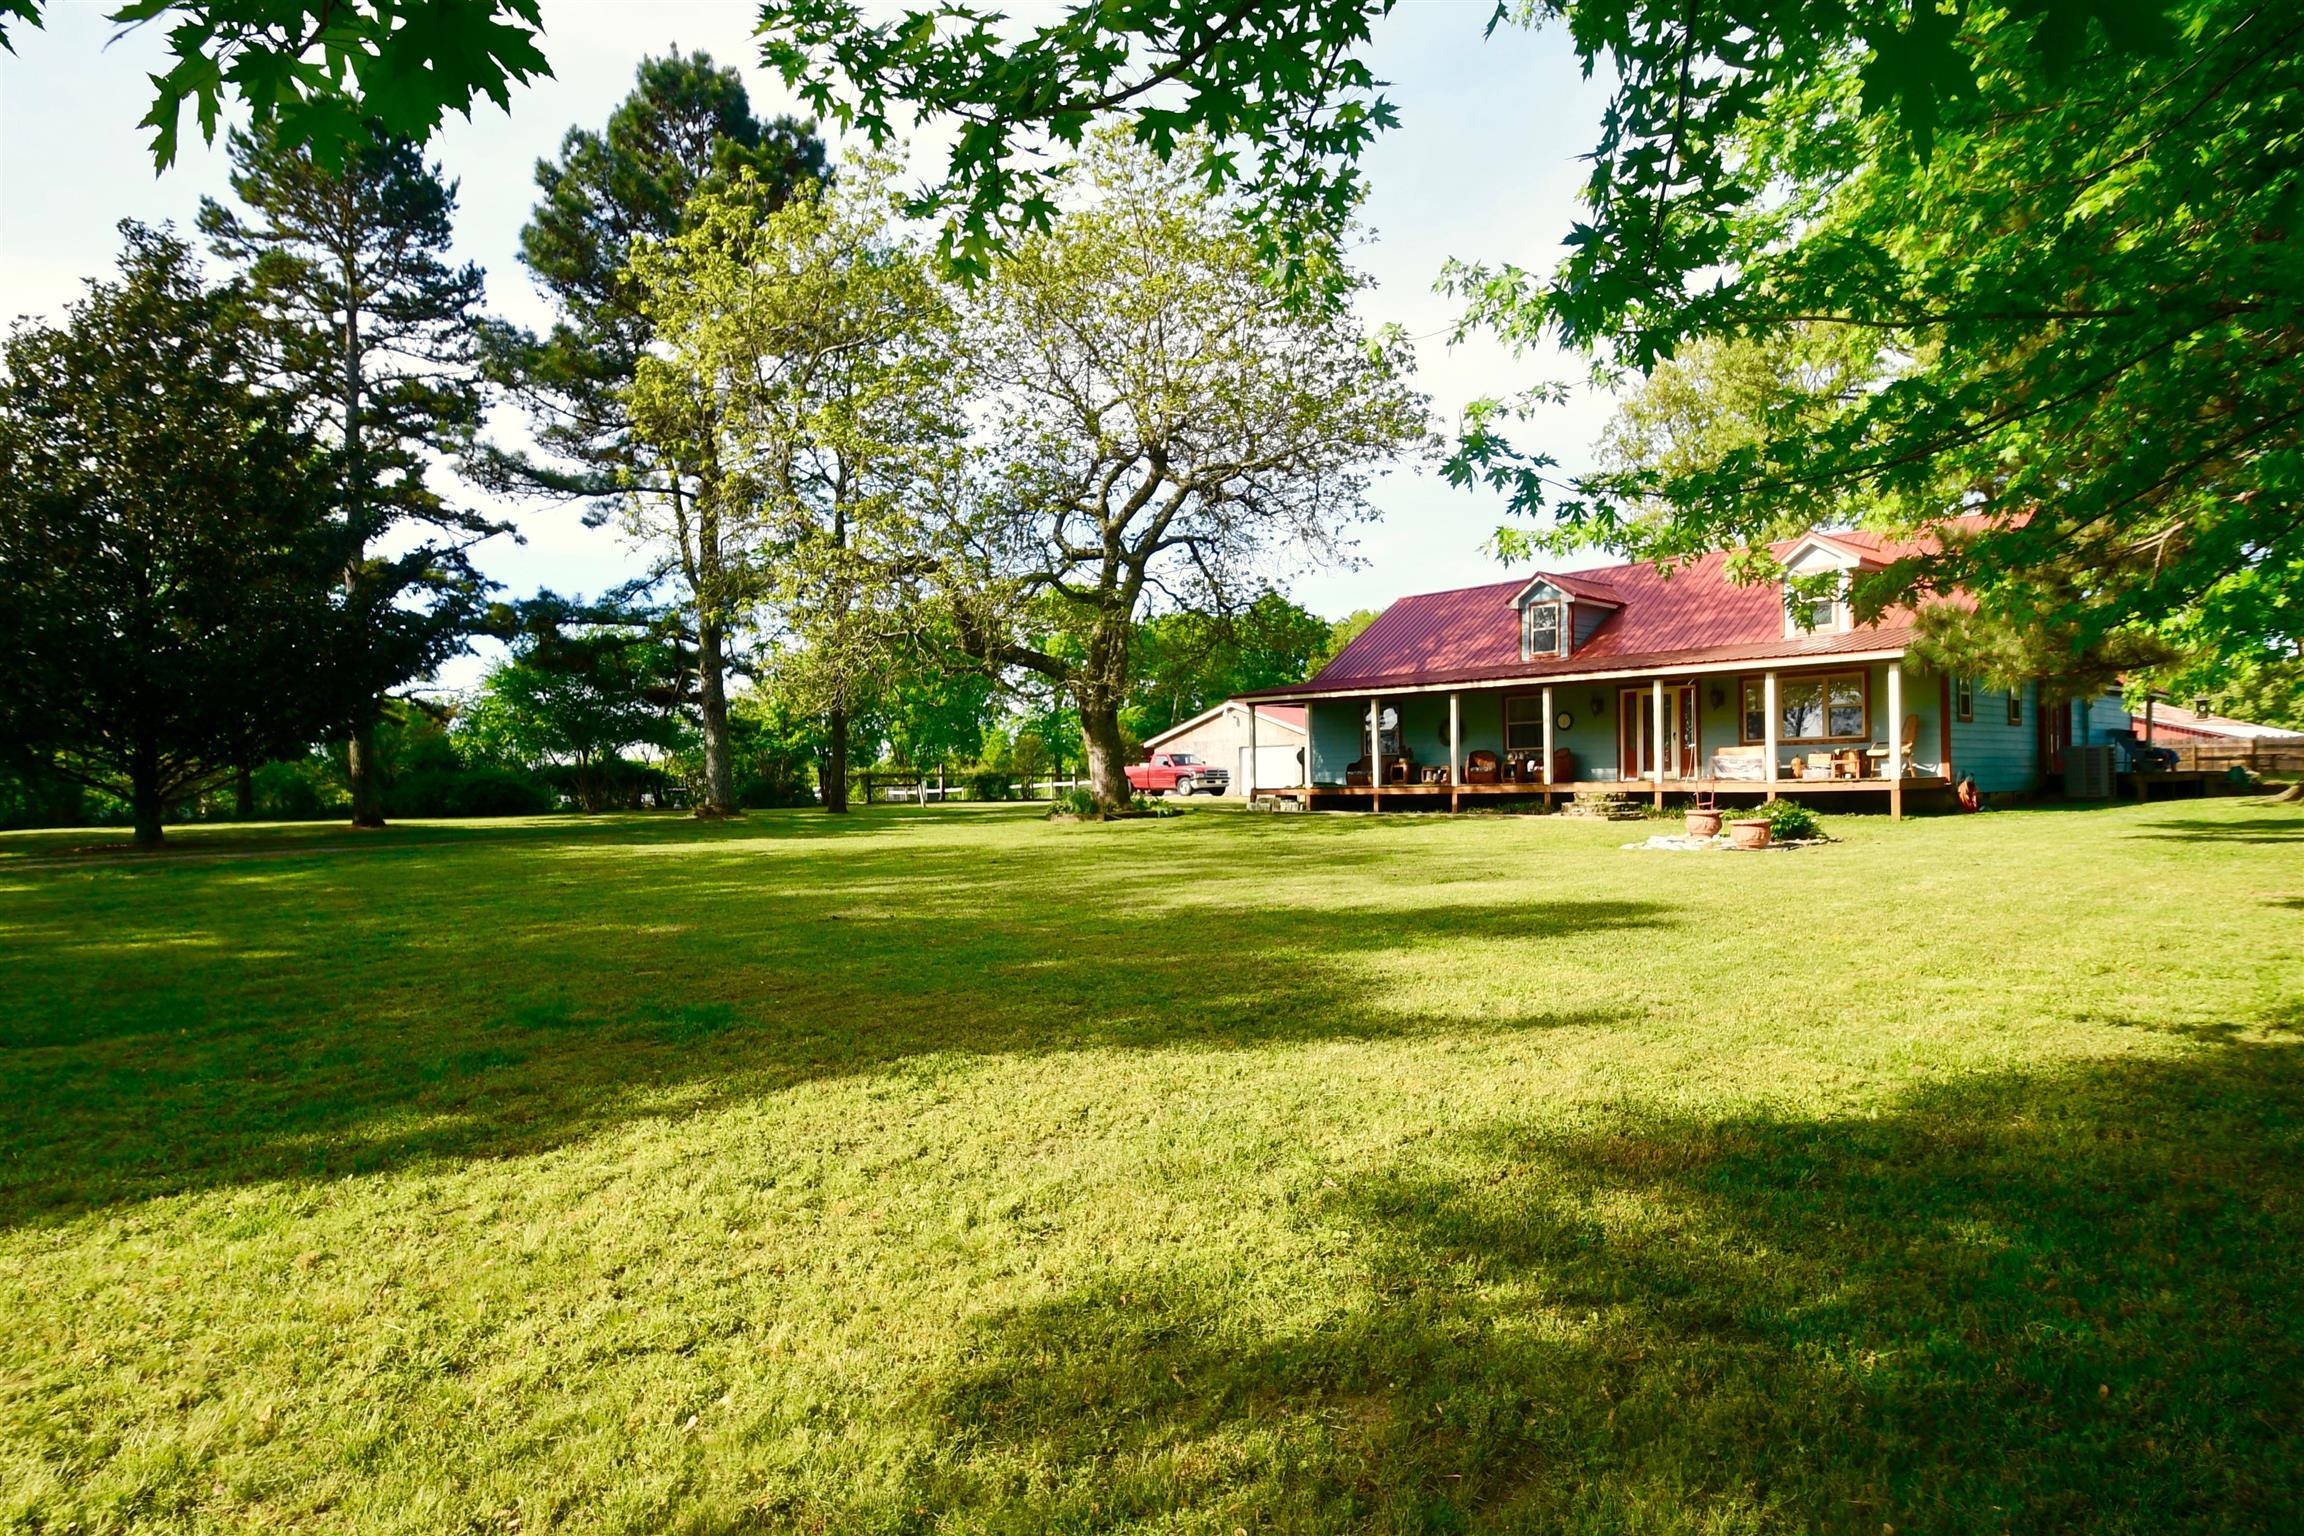 9529 Buttermilk Ridge Rd, Lawrenceburg, TN 38464 - Lawrenceburg, TN real estate listing